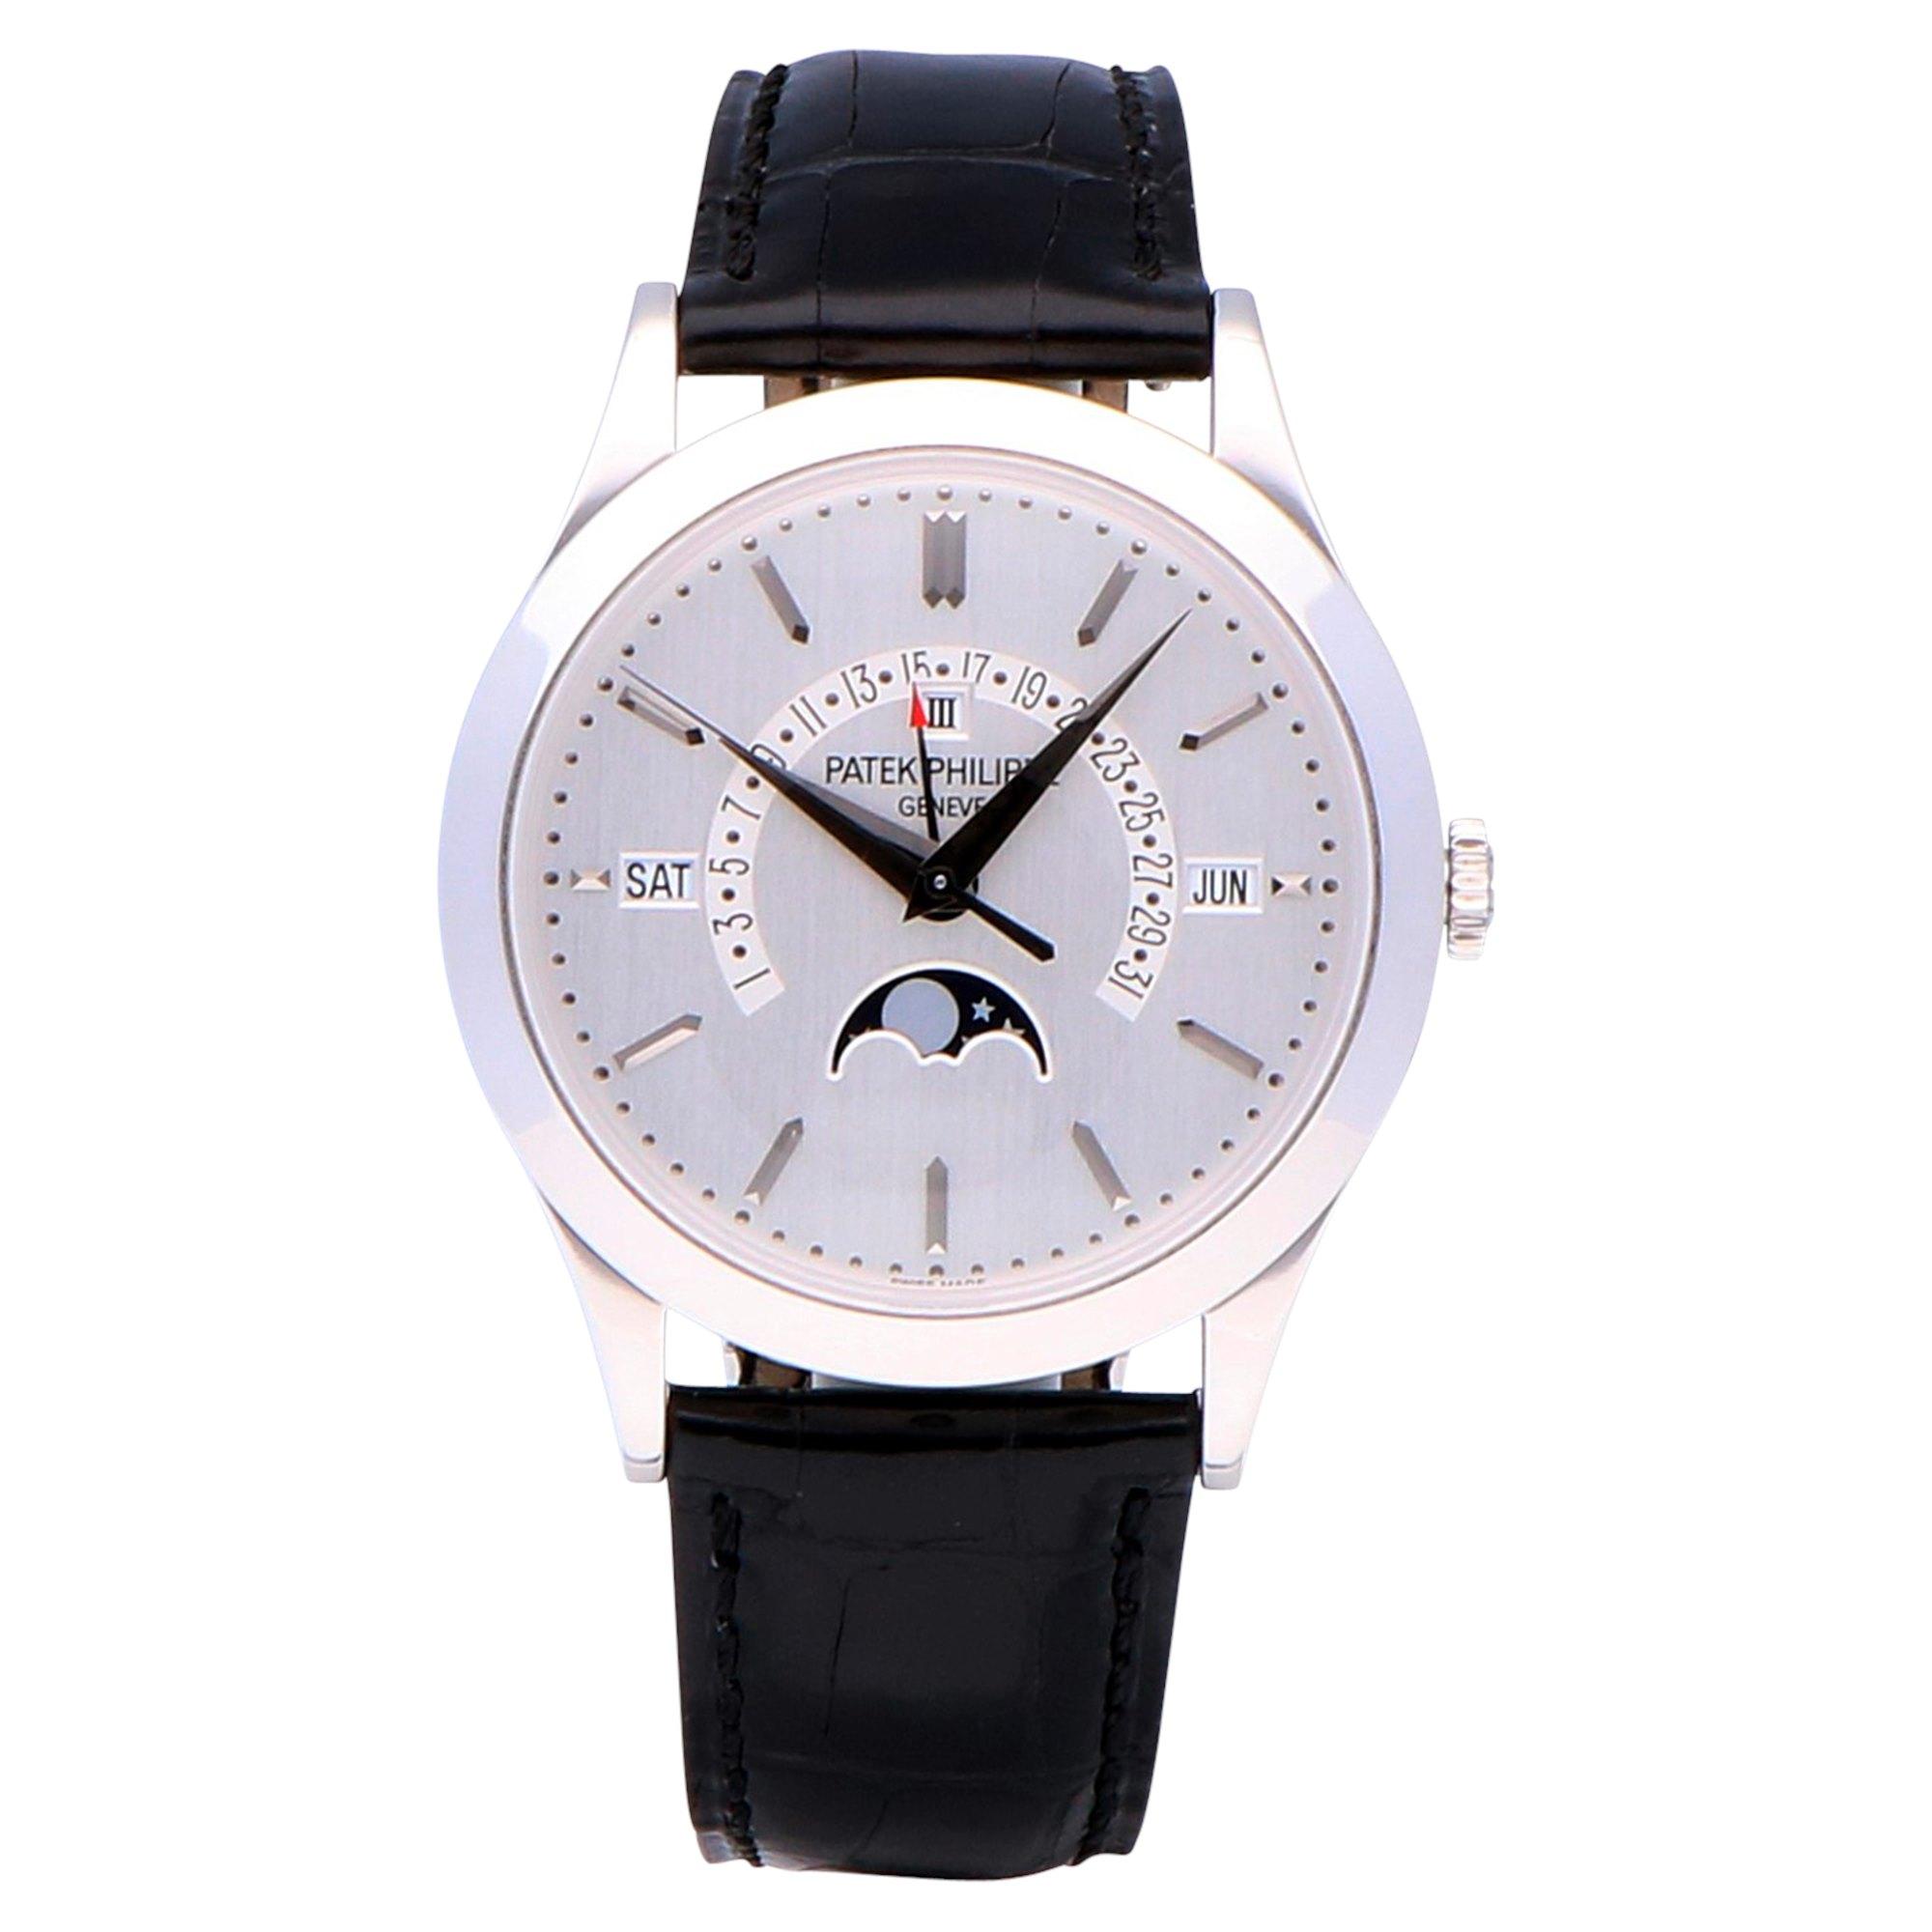 Patek Philippe Grand Complications Perpetual Calendar Platinum 5496P-001